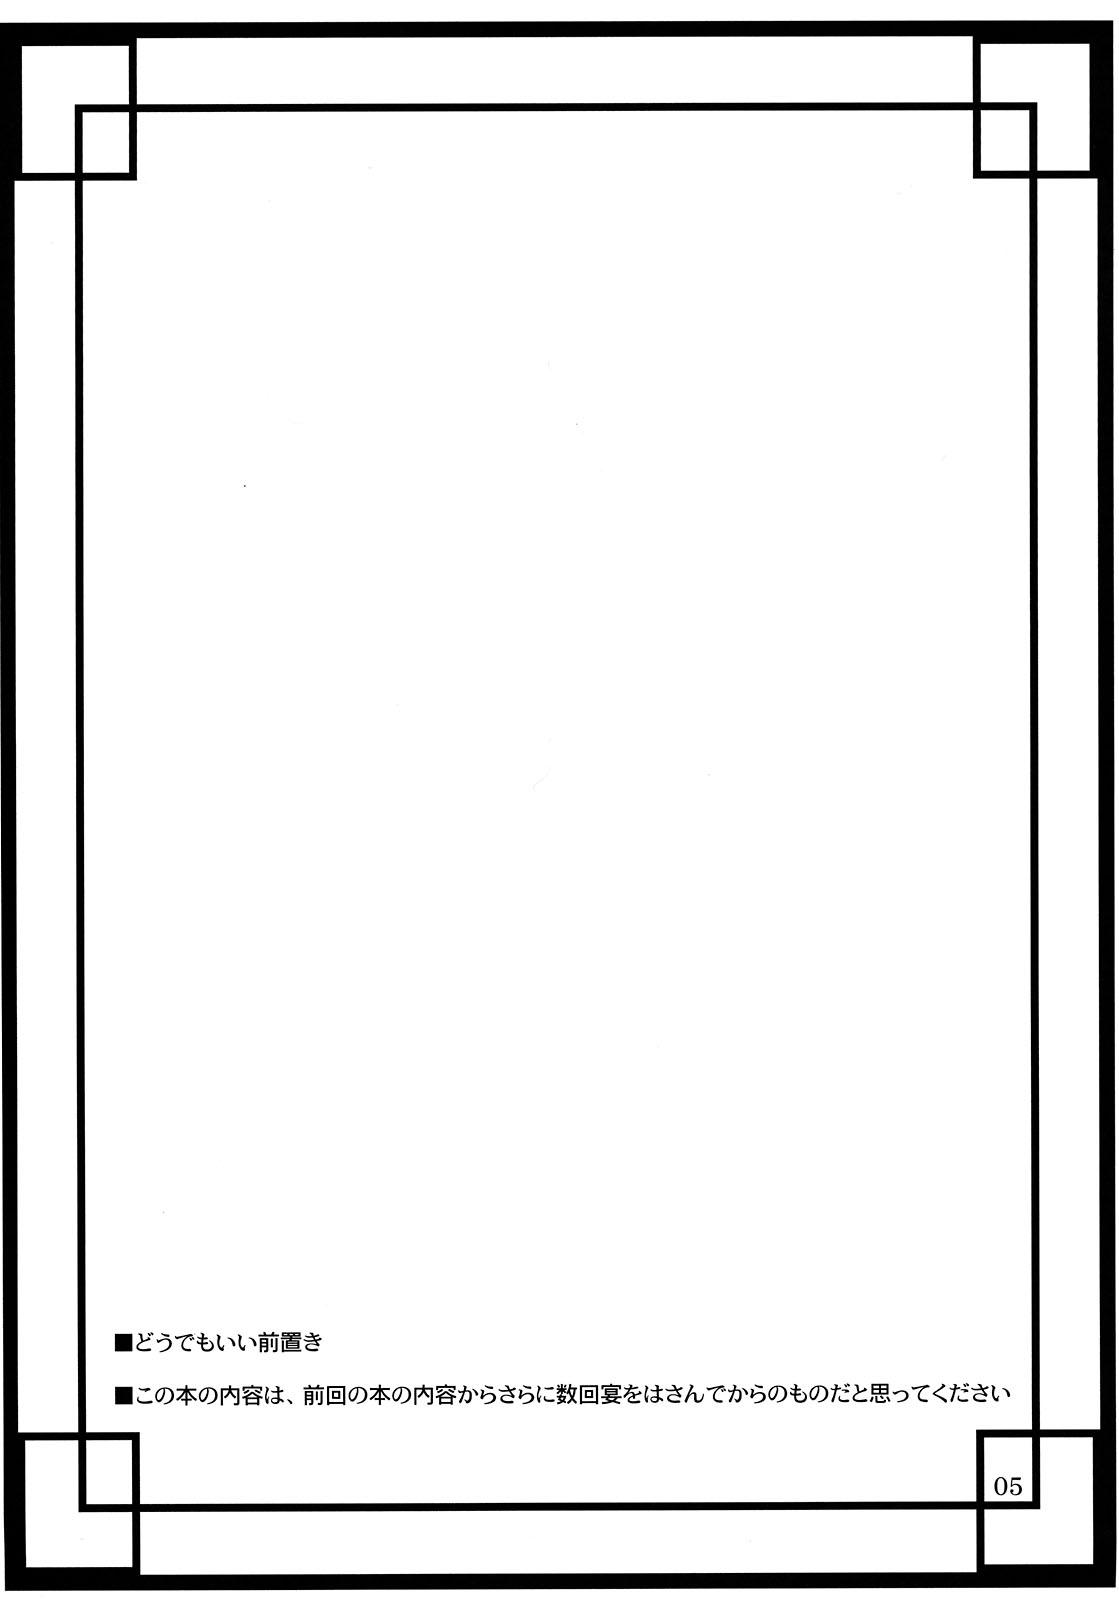 Toshima-tachi no Kyouen 2 4